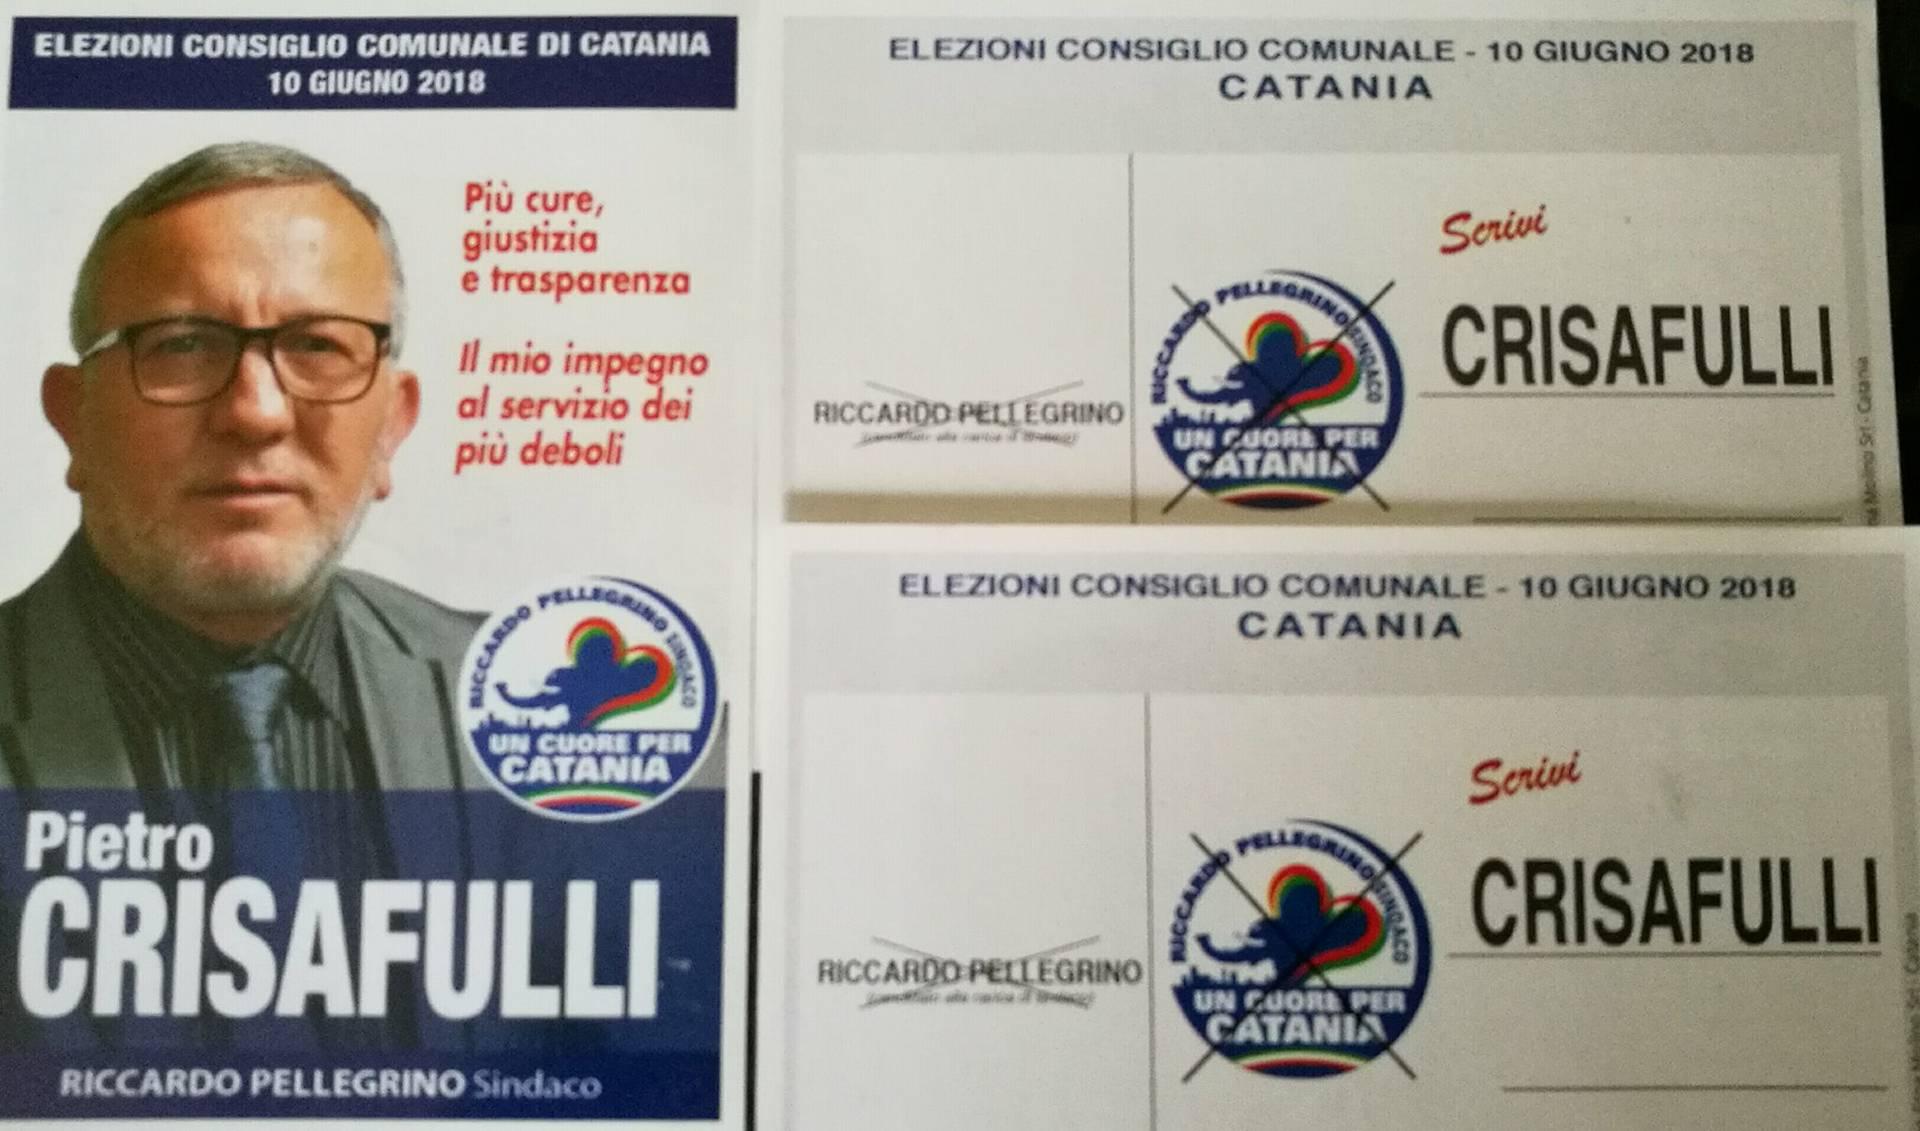 Elezioni catania crisafulli